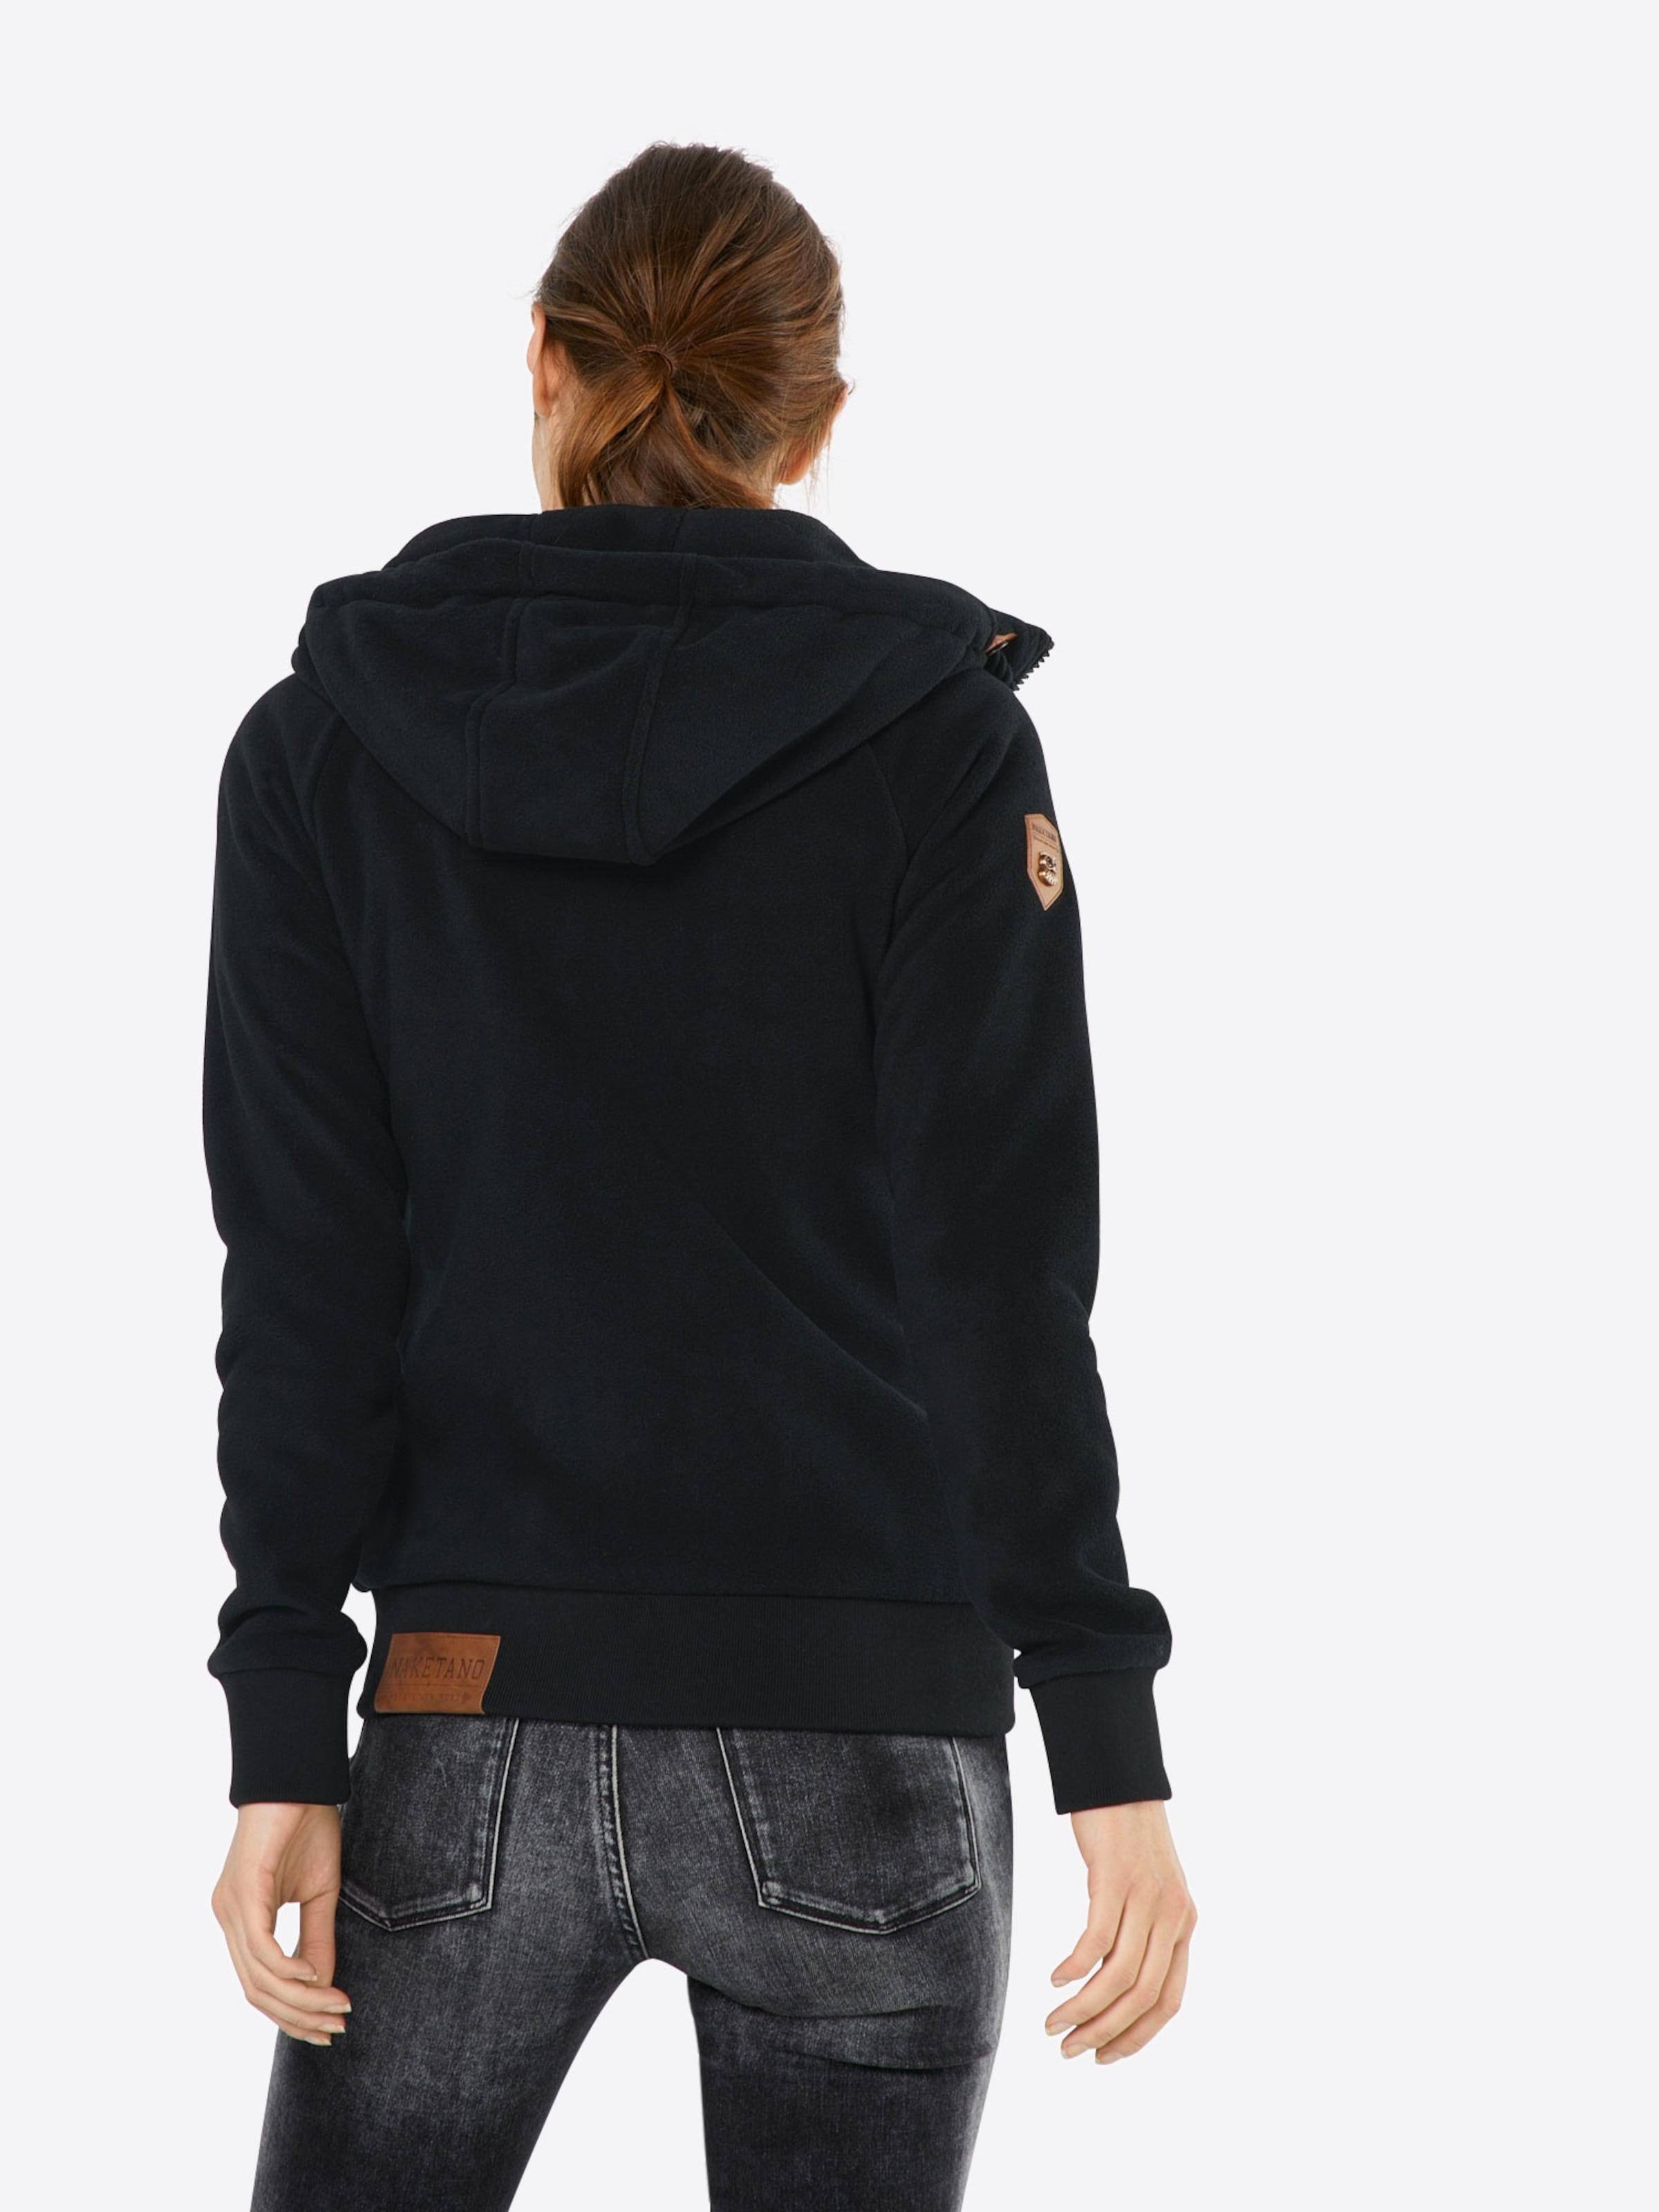 Meroni' Sweatshirtjacke naketano aus Sweatshirtjacke Sweatshirtjacke Fleece 'Gigi aus Fleece 'Gigi naketano aus Fleece Meroni' naketano H4Bqff